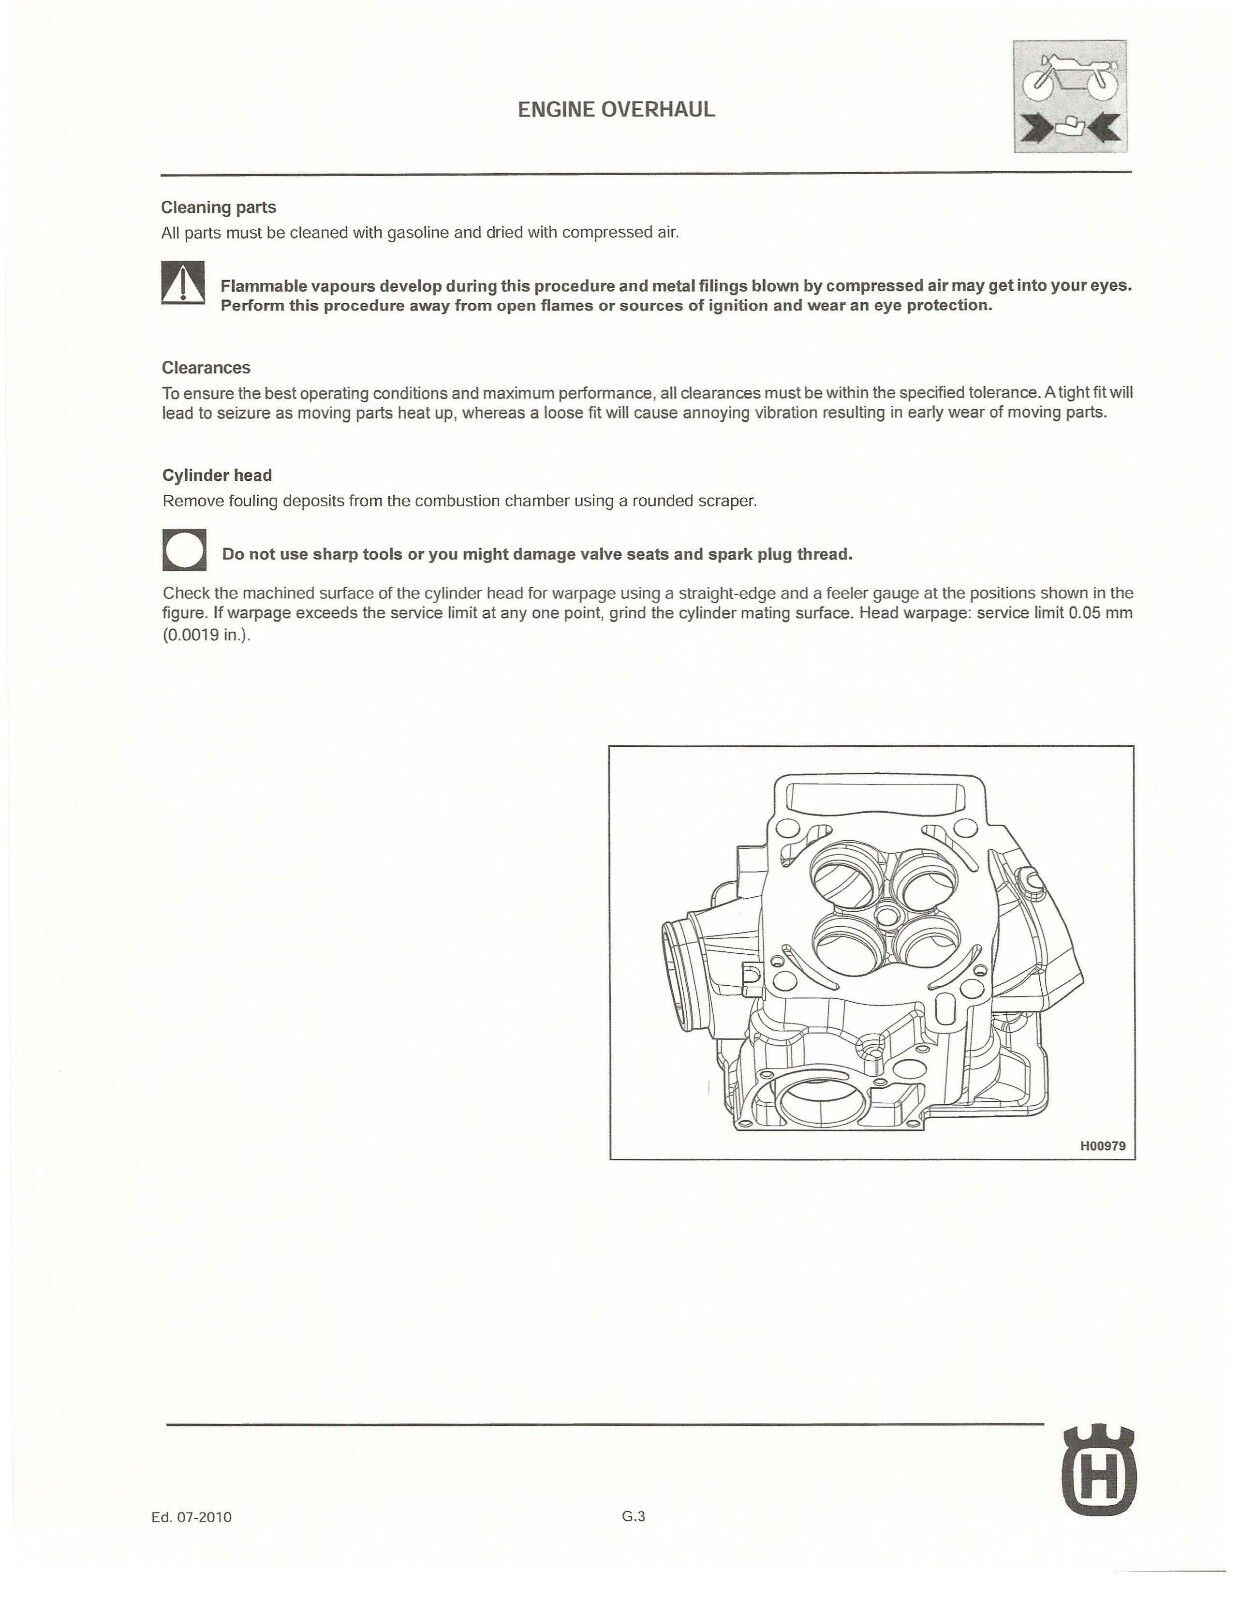 ... workshop service manual 2011 TC 250 3 of 12 Husqvarna ...